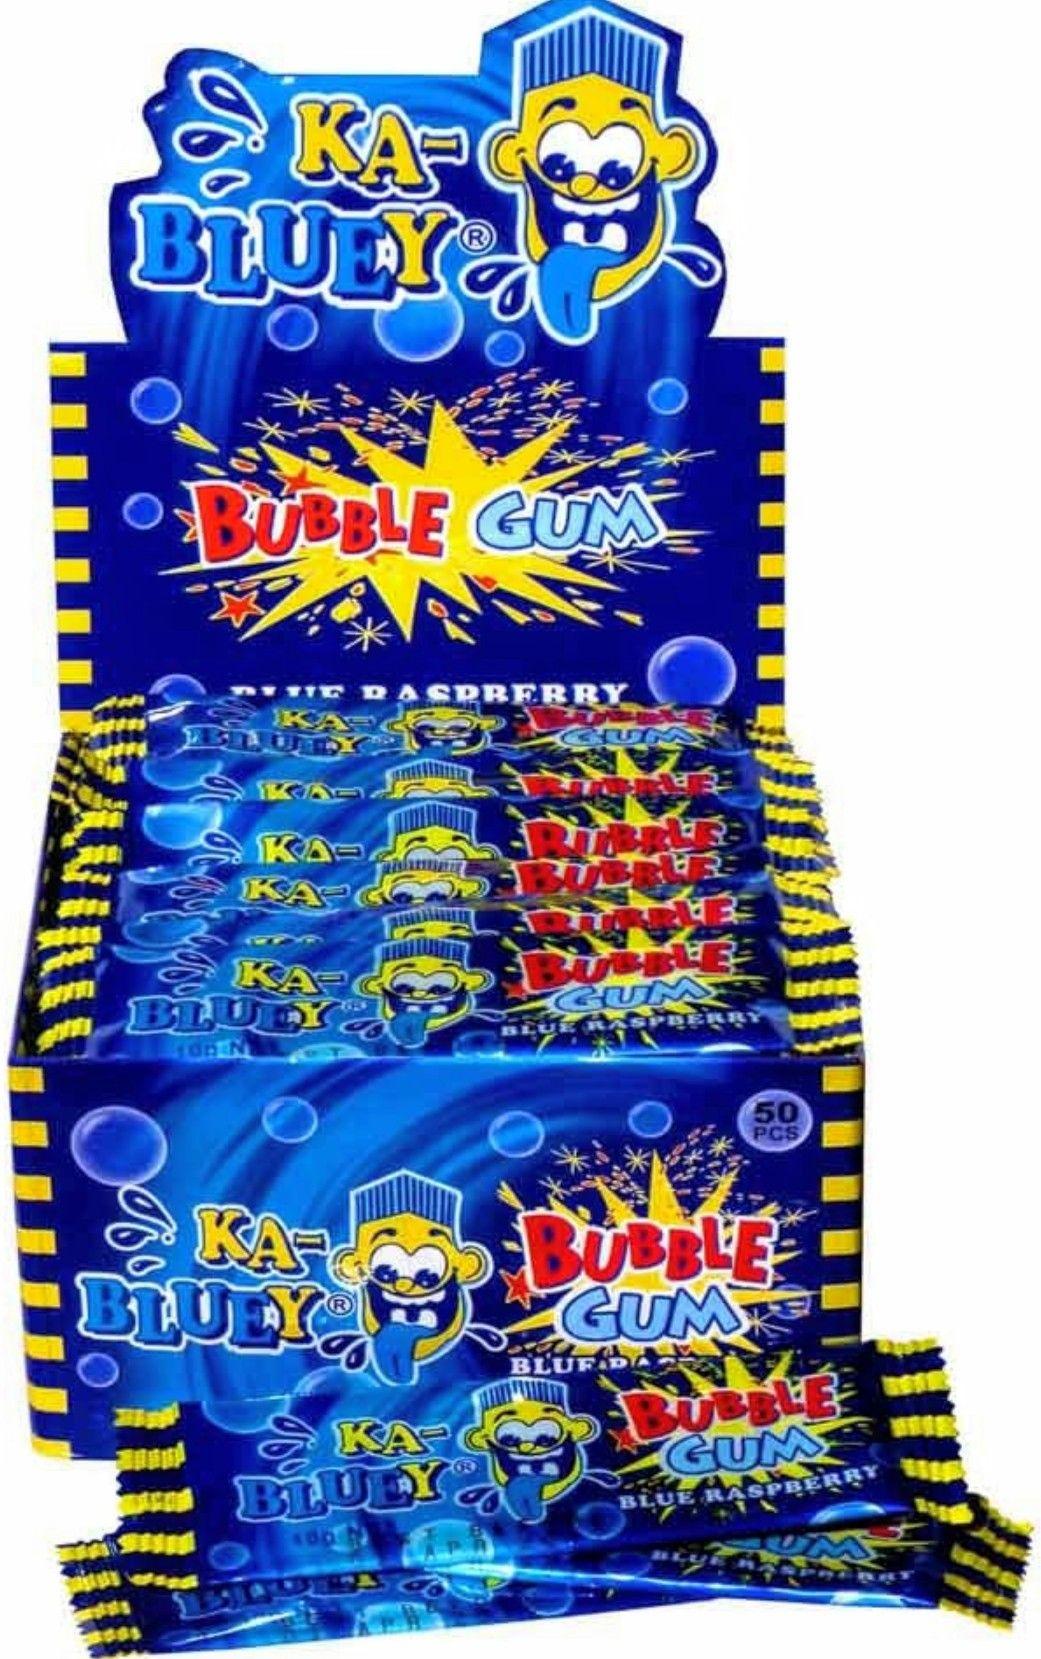 Ka Bluey Candy Bubble Gum Buble Gum Candy